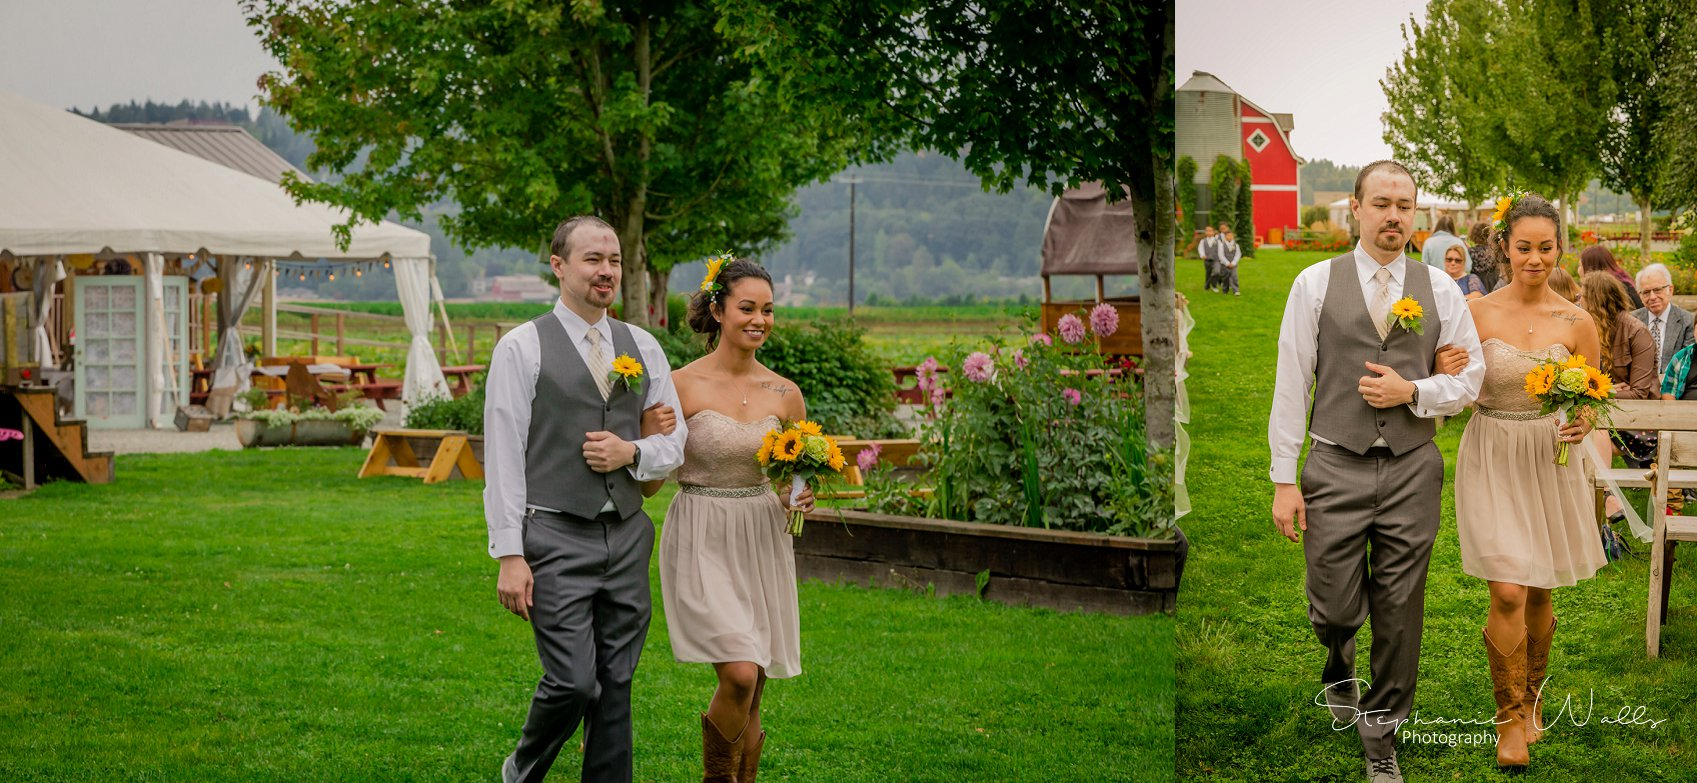 Kimble Wedding 080 Marlena & Allans | Snohomish Red Barn Events (Stocker Farms) | Snohomish, Wa Wedding Photographer